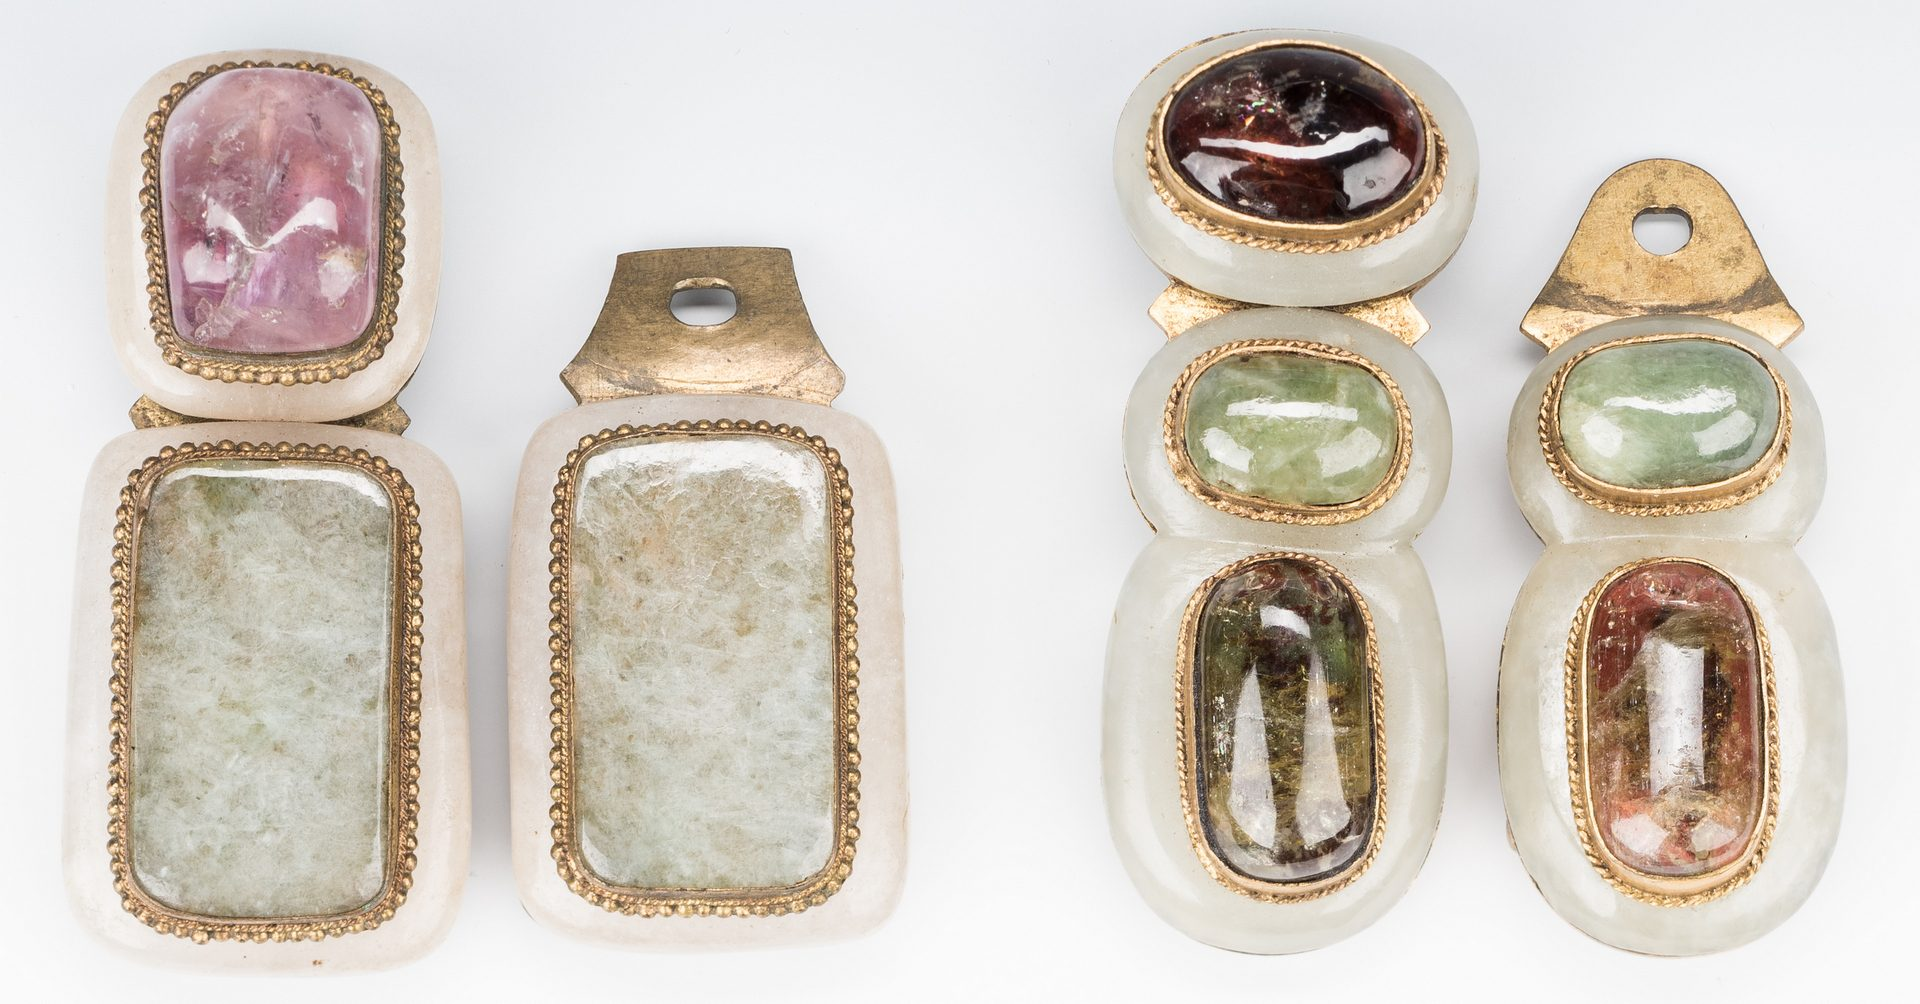 Lot 5: 3 Chinese Jade, Stone & Gilt Bronze Belt Buckles